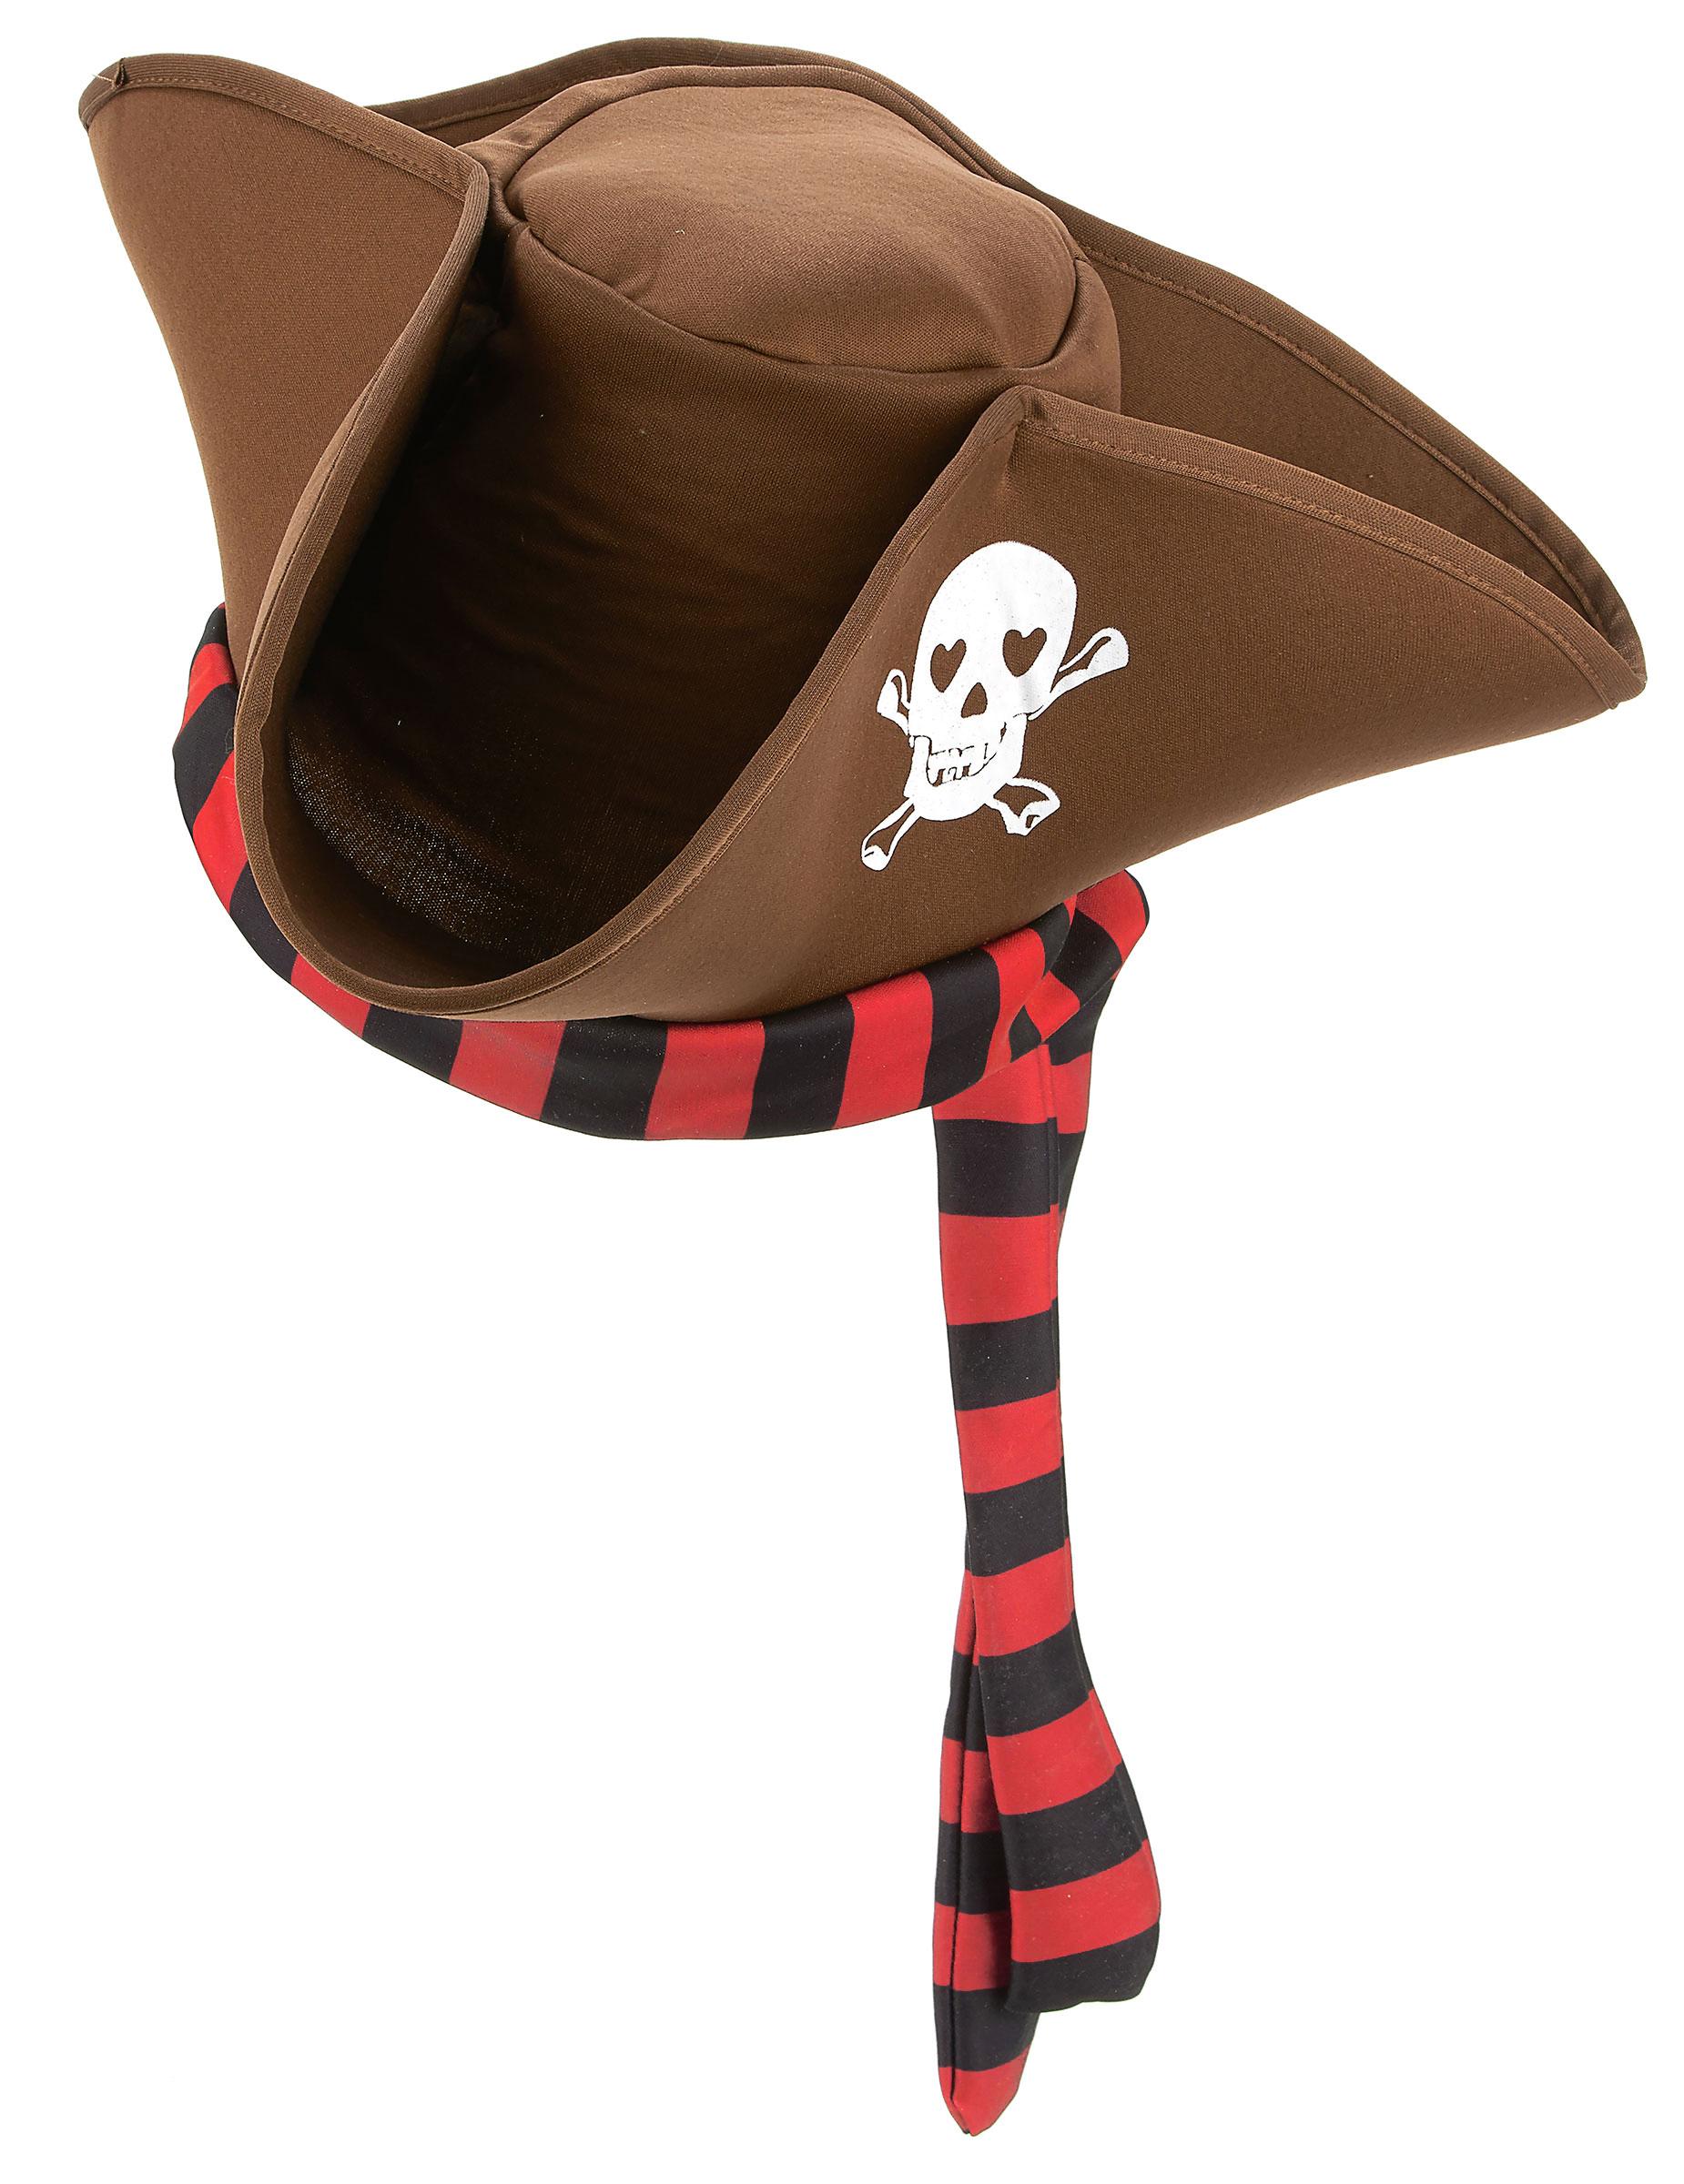 Sombreros piratas para disfraces - Vegaoo.es 16ca8ebf57e